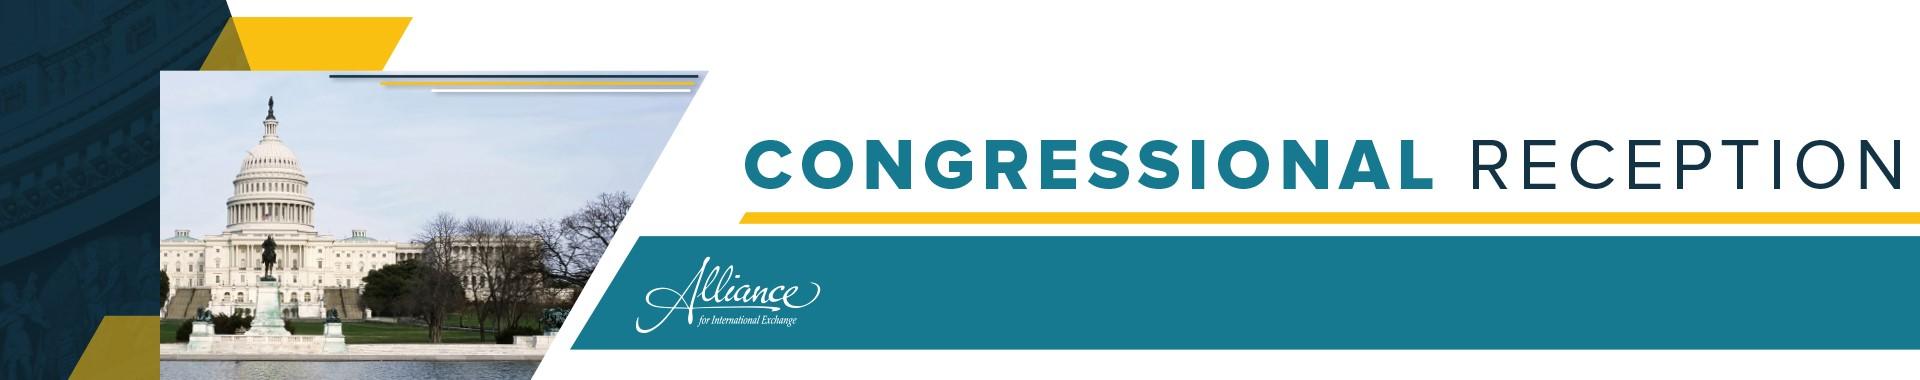 2018 Congressional Reception